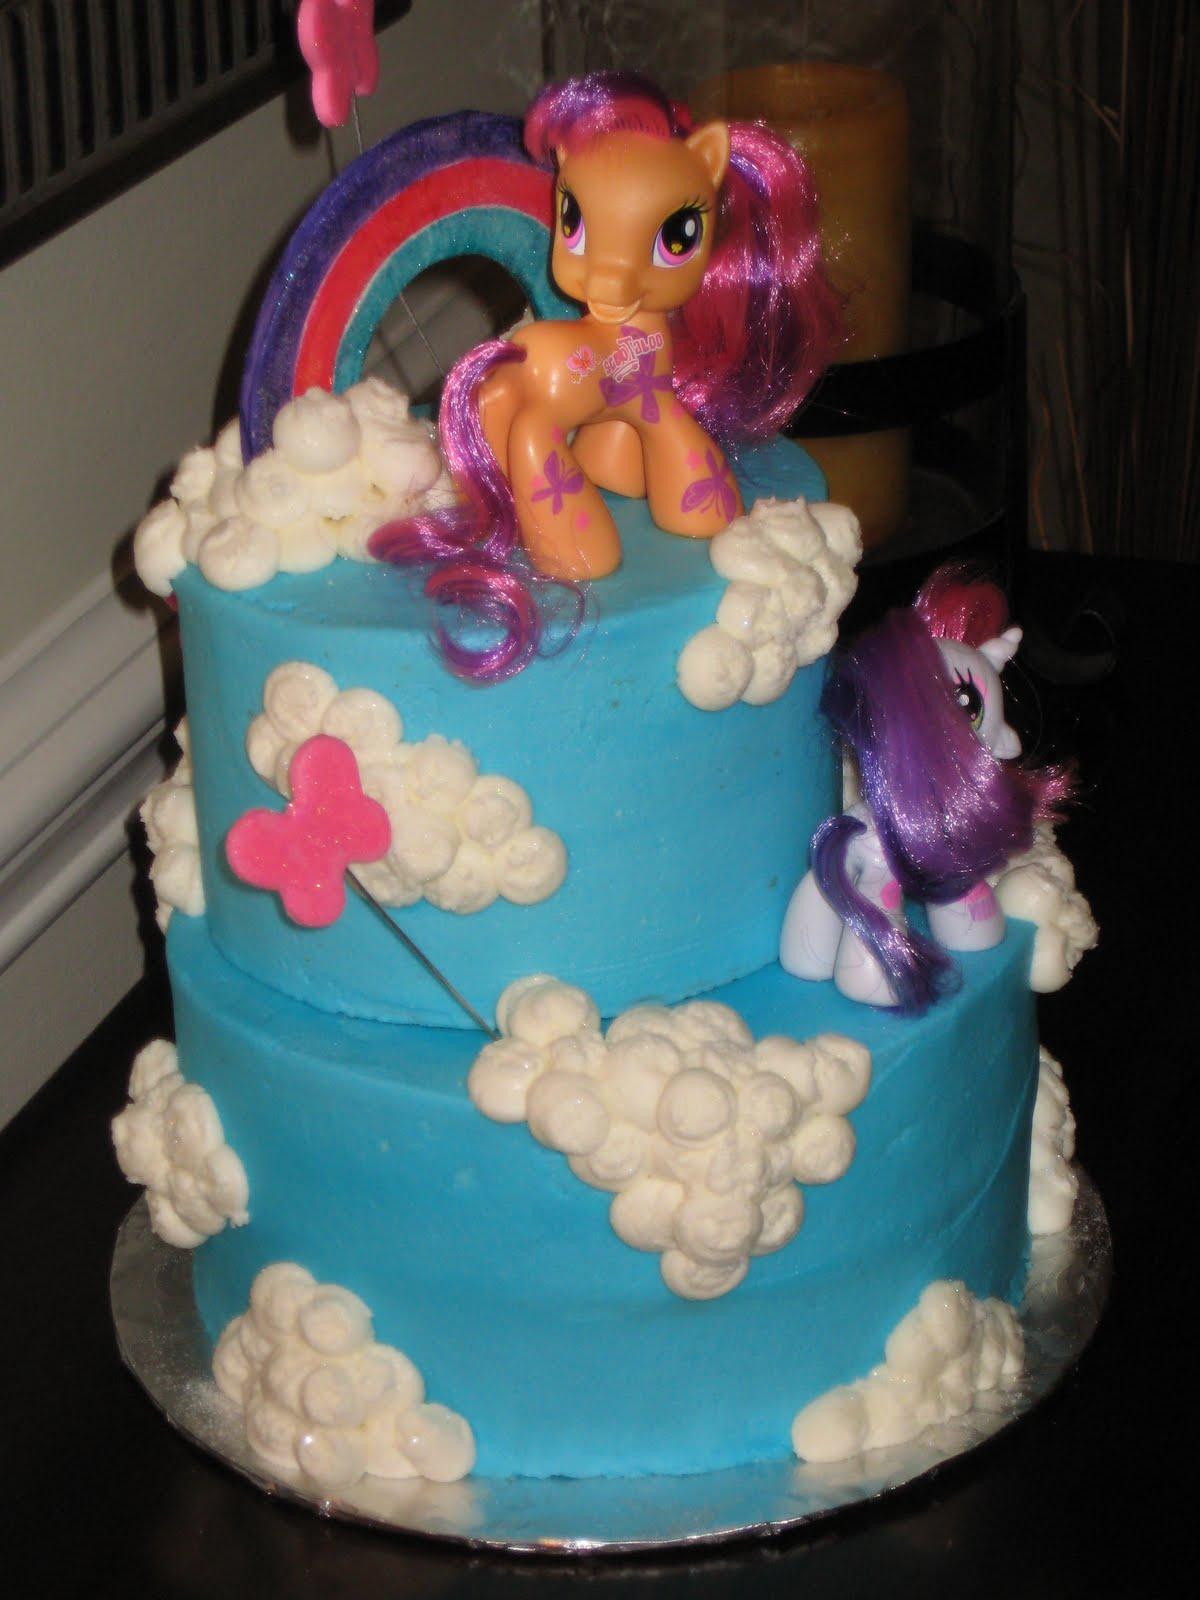 My Little Pony Birthday Cake Ideas And Designs